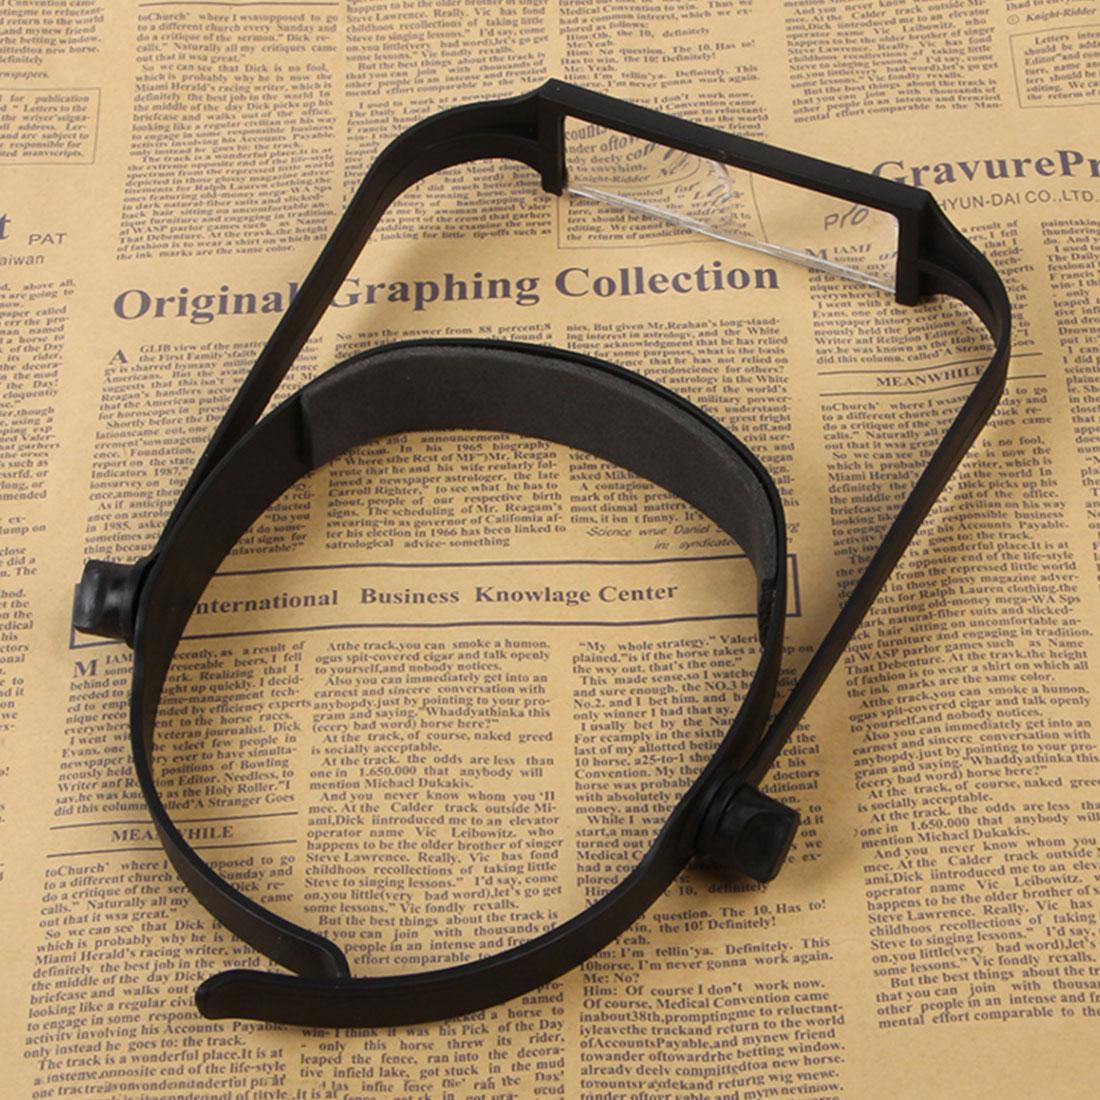 Nova 1.6x 2.0x 2.5x 3.5x Lente Substituível Cabeça Headband Lupa Lupa Lupa lupa Lente de vidro óptico